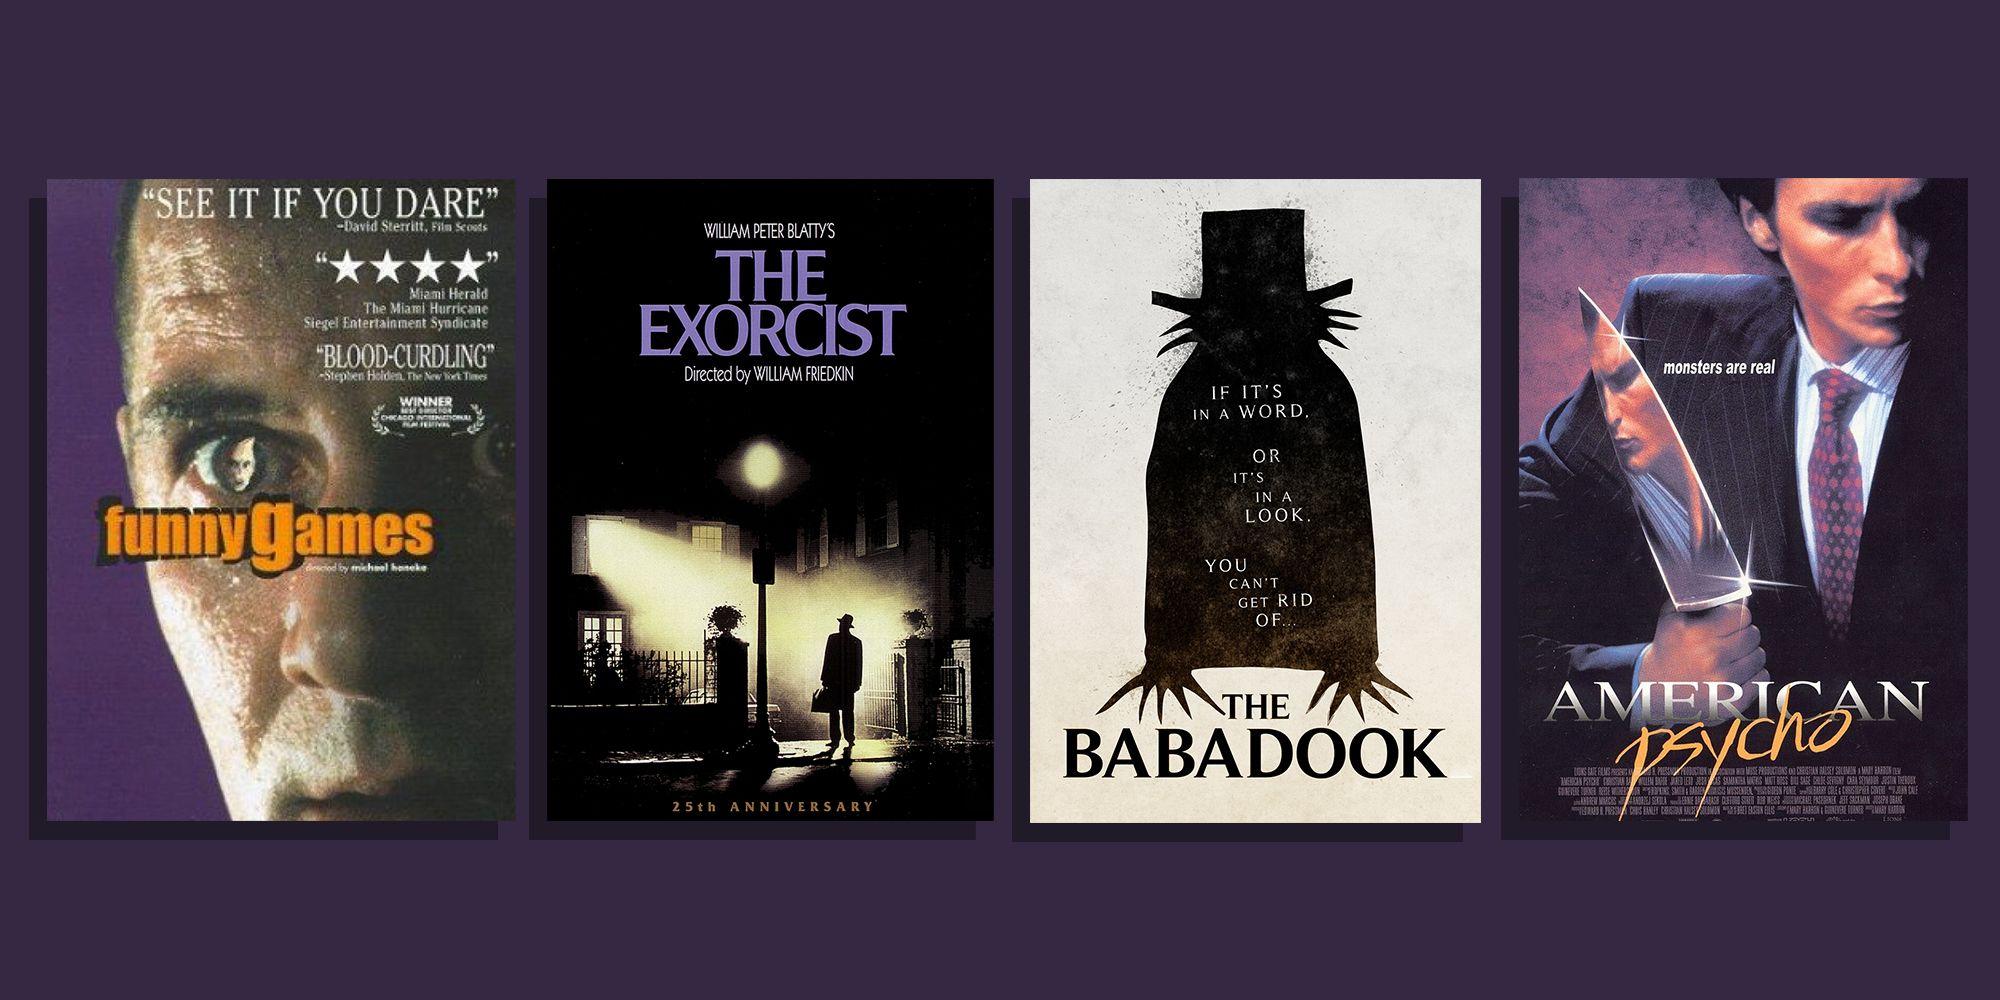 halloween horror movies best 2018